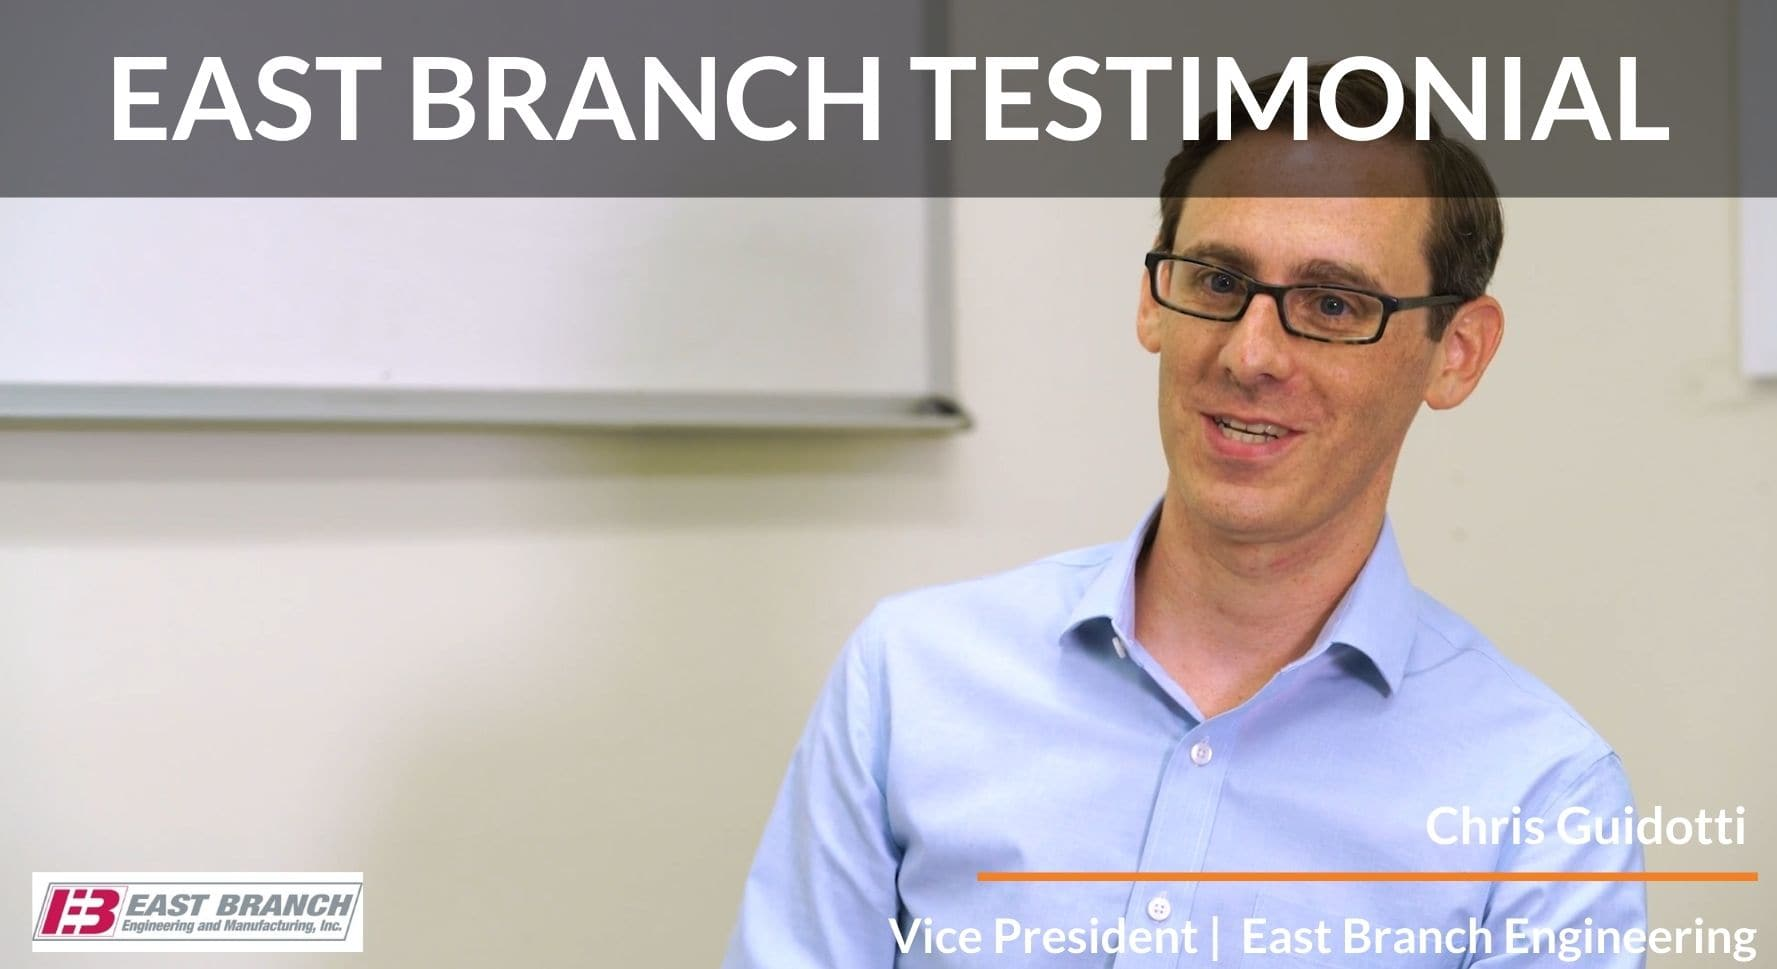 Eat Branch Testimonial